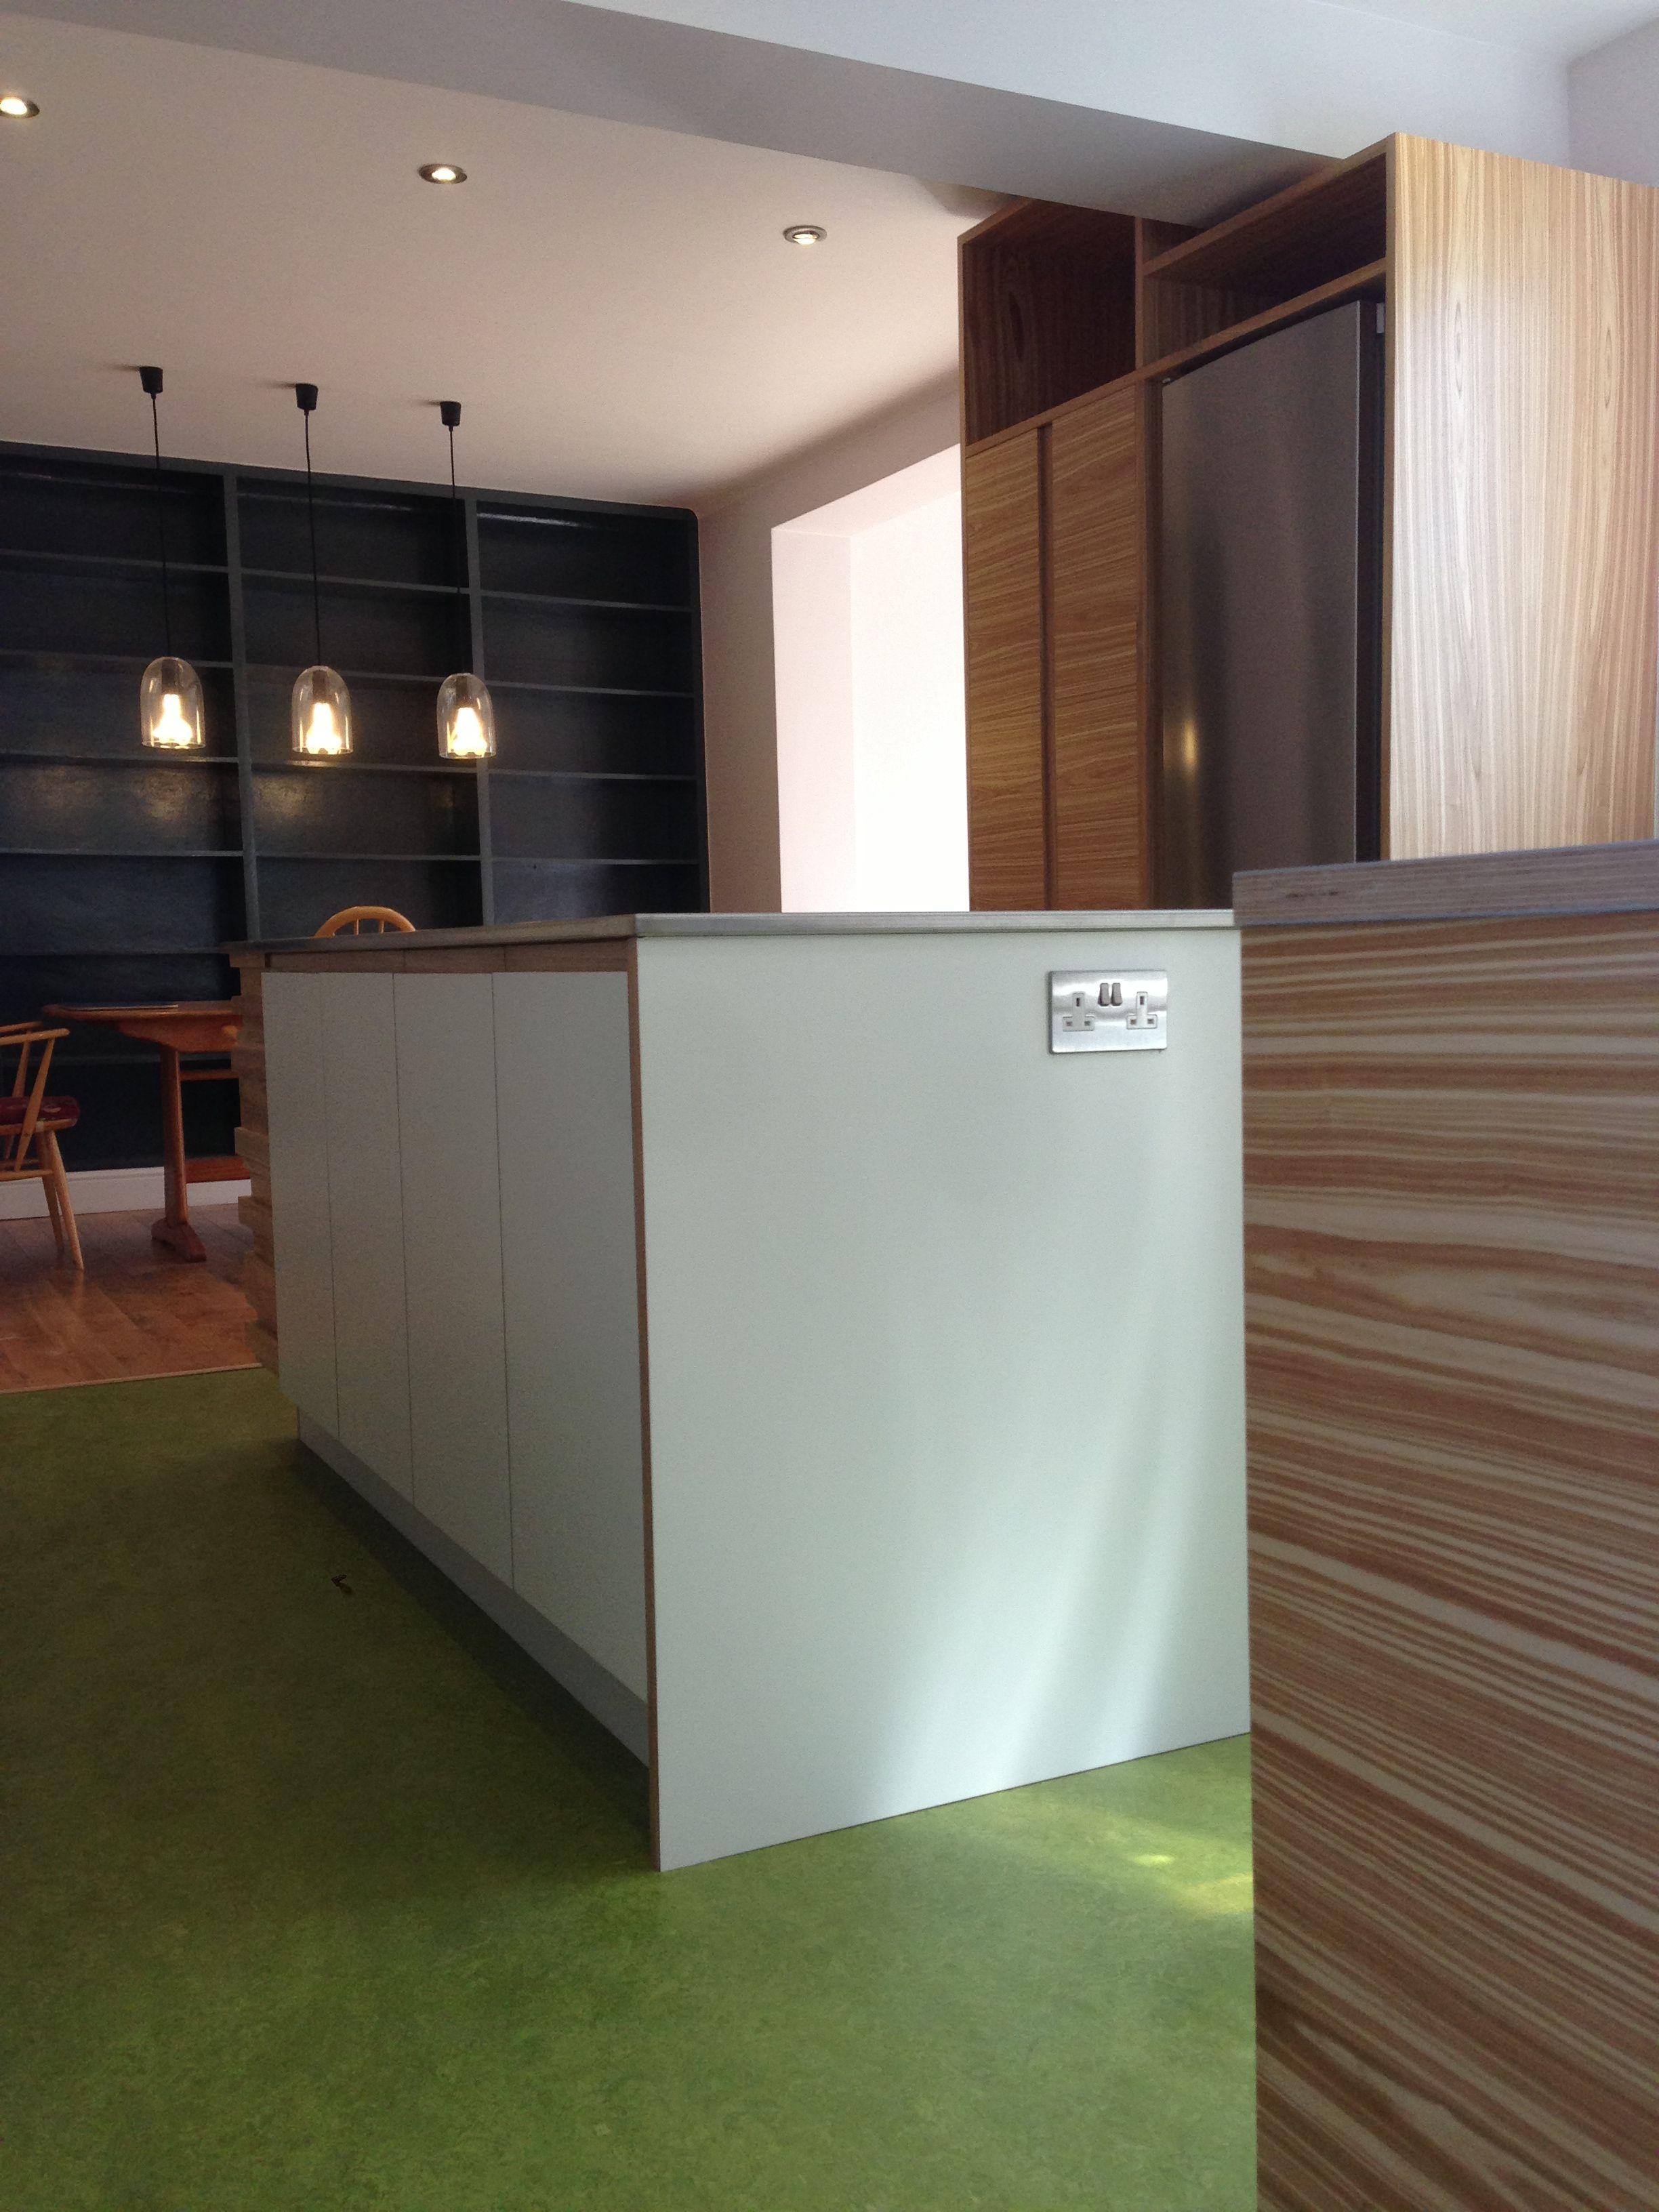 sq1 kitchen olive ash stainless steel formica oak veneered